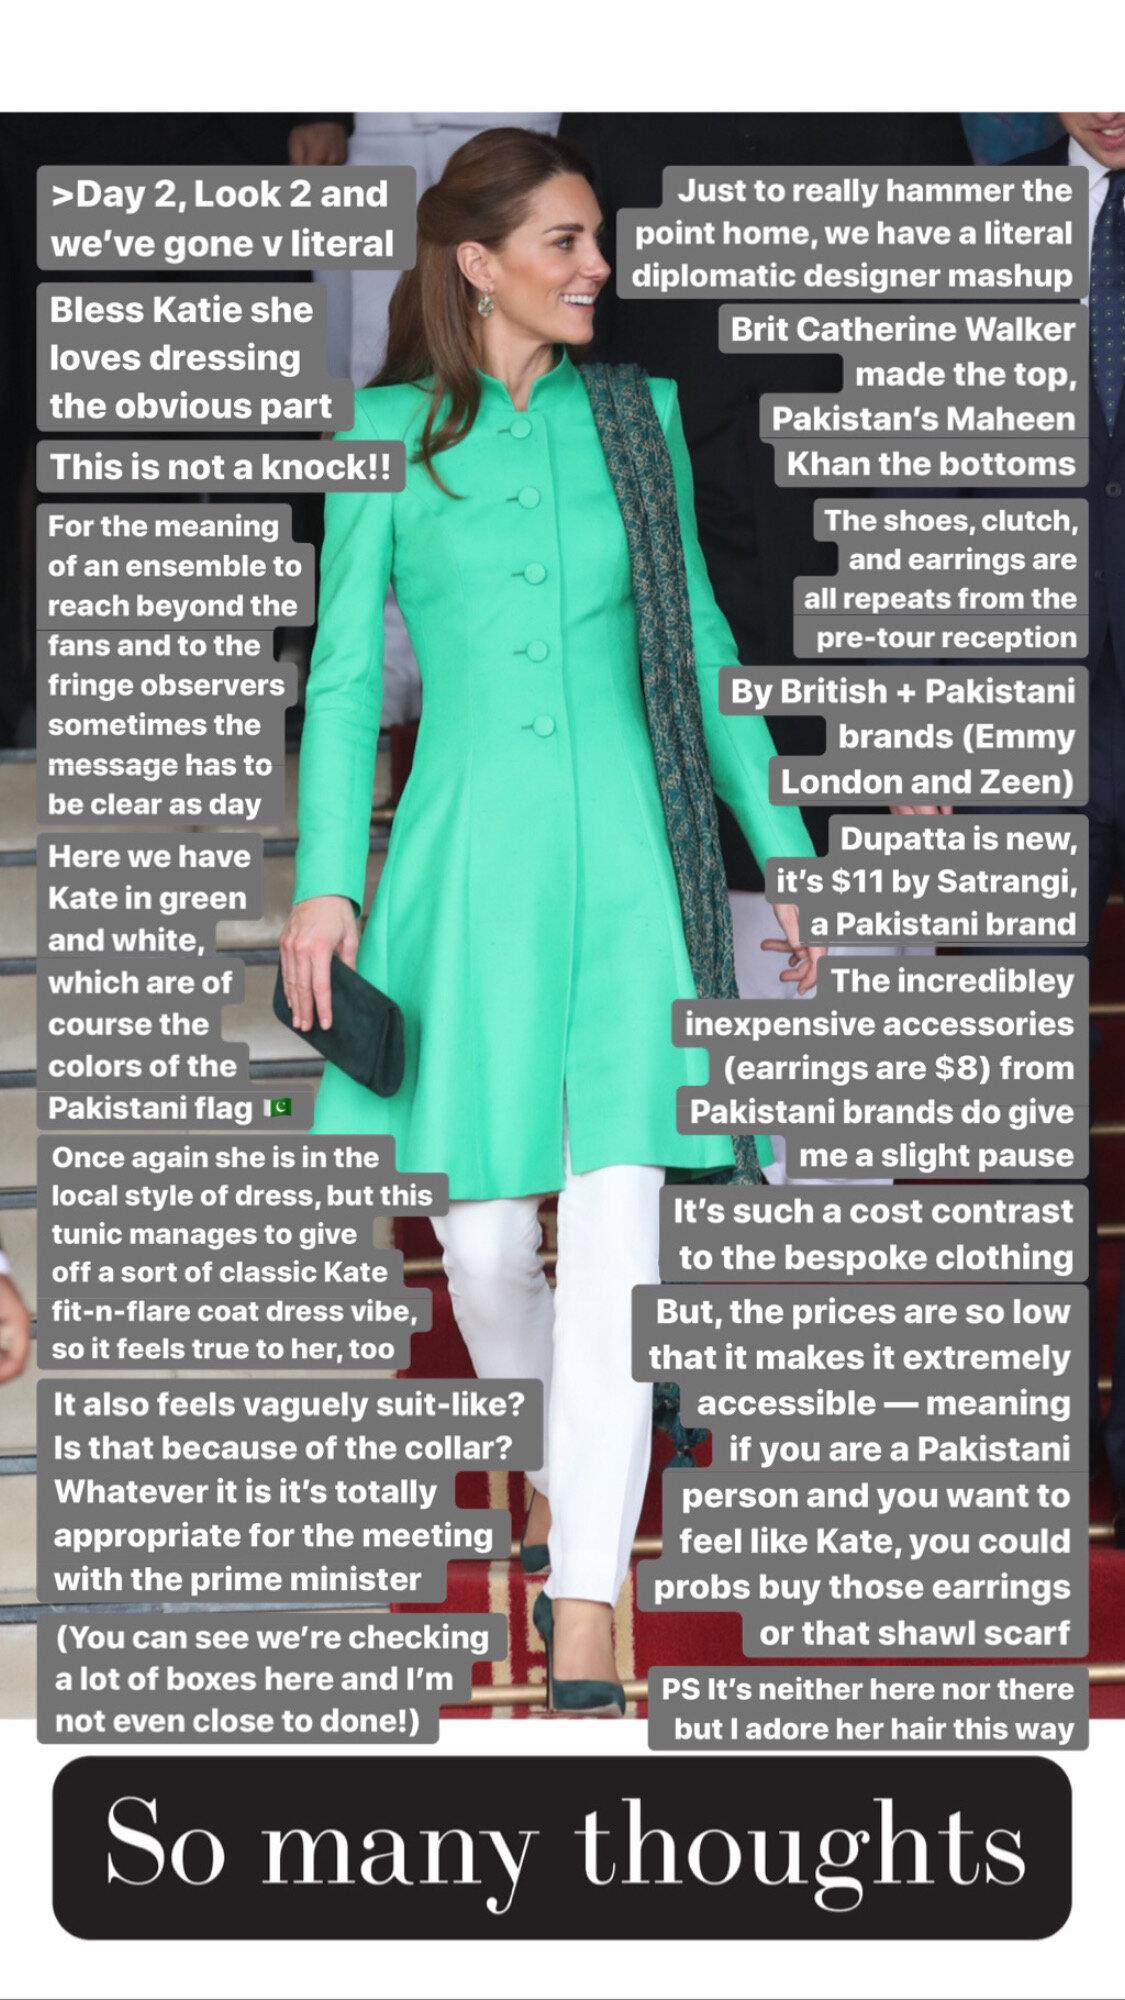 Kate_PakistanDay2_look2b.JPG